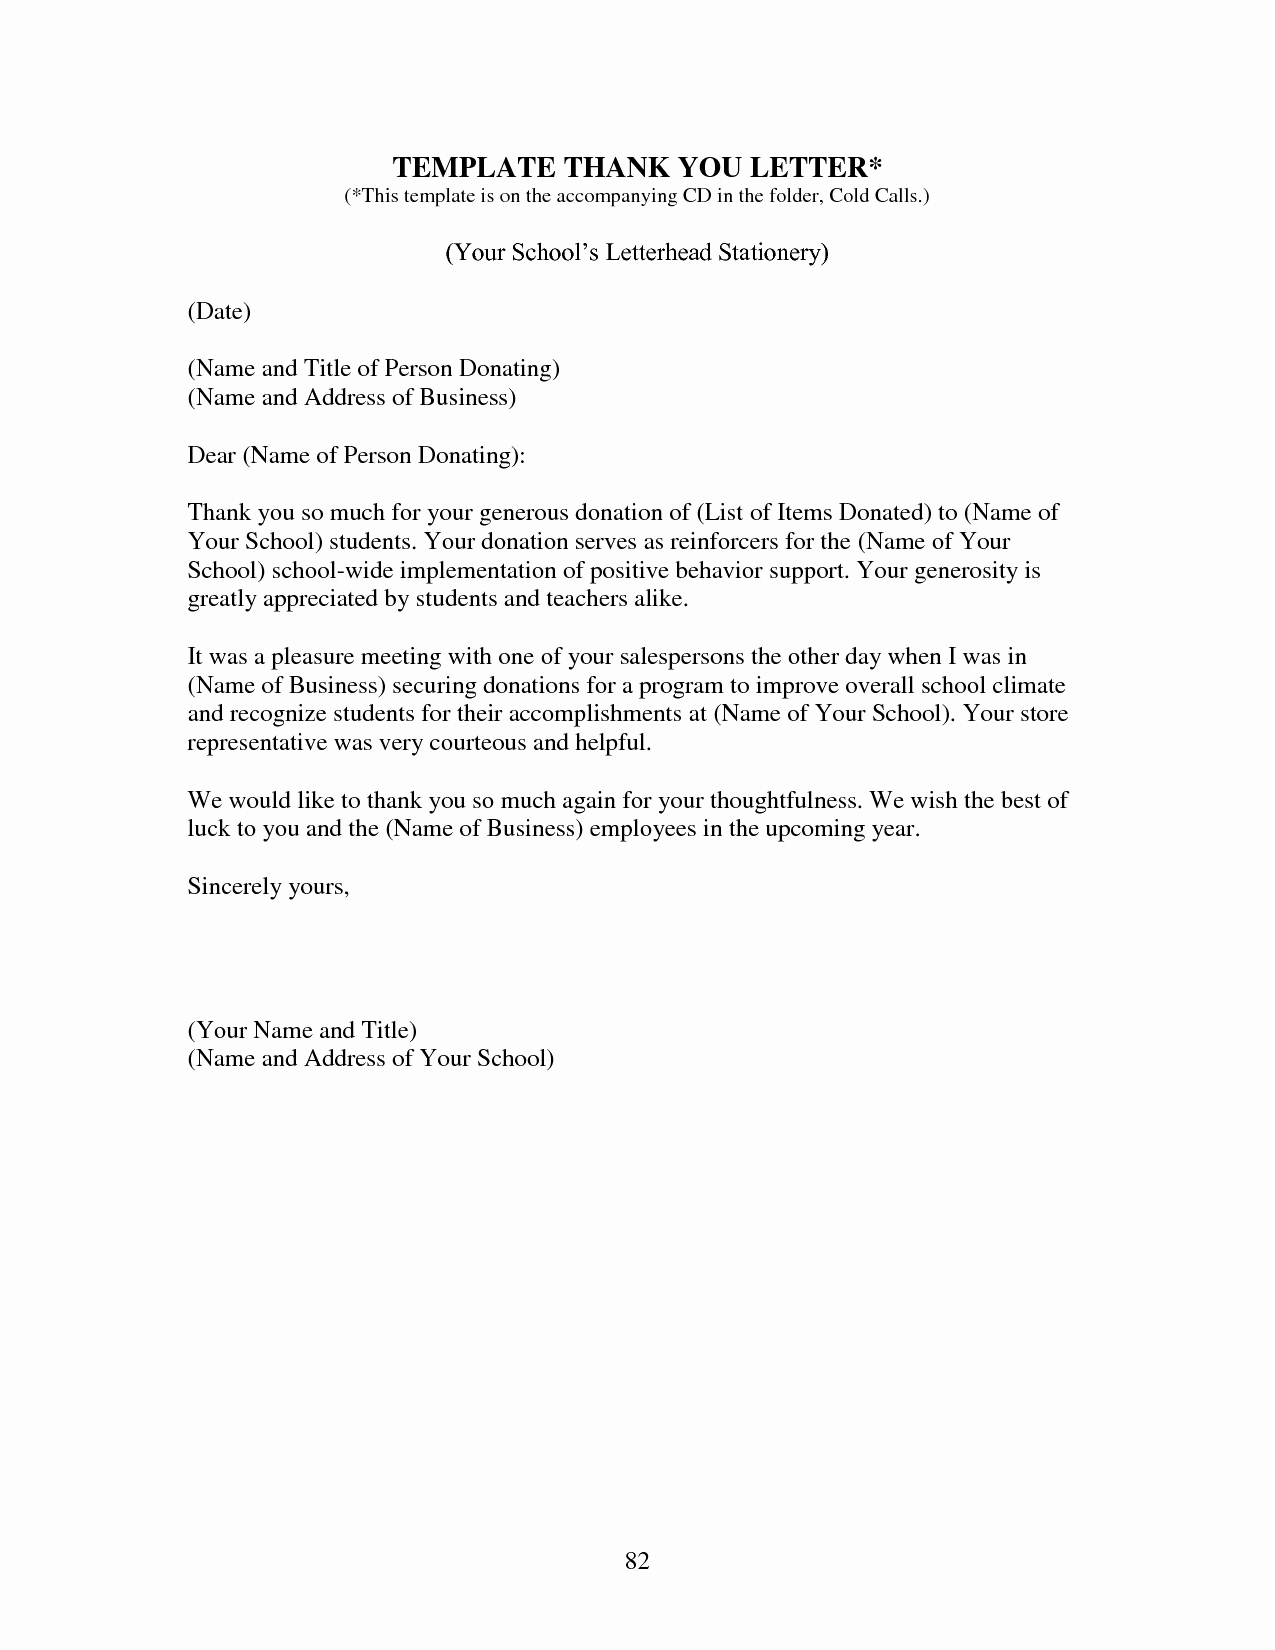 Sample Donation Letter Template - Sample Cover Letter Template Fresh Od Consultant Cover Letter